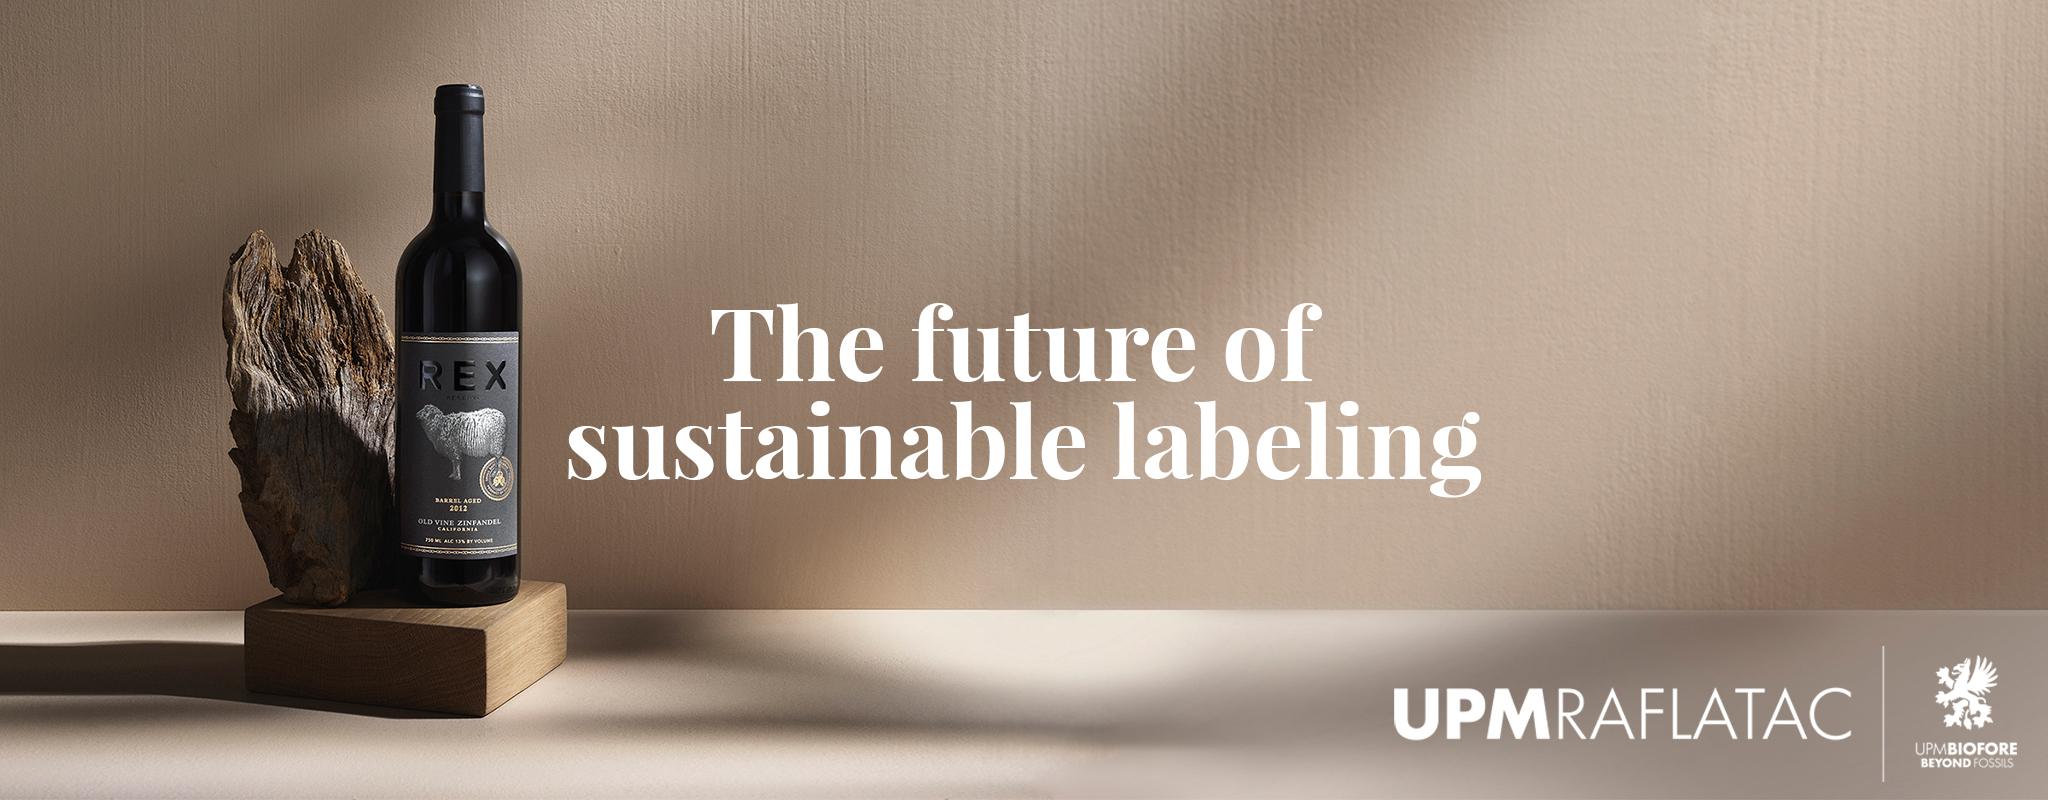 UPM Raflatac - sustainable labeling future